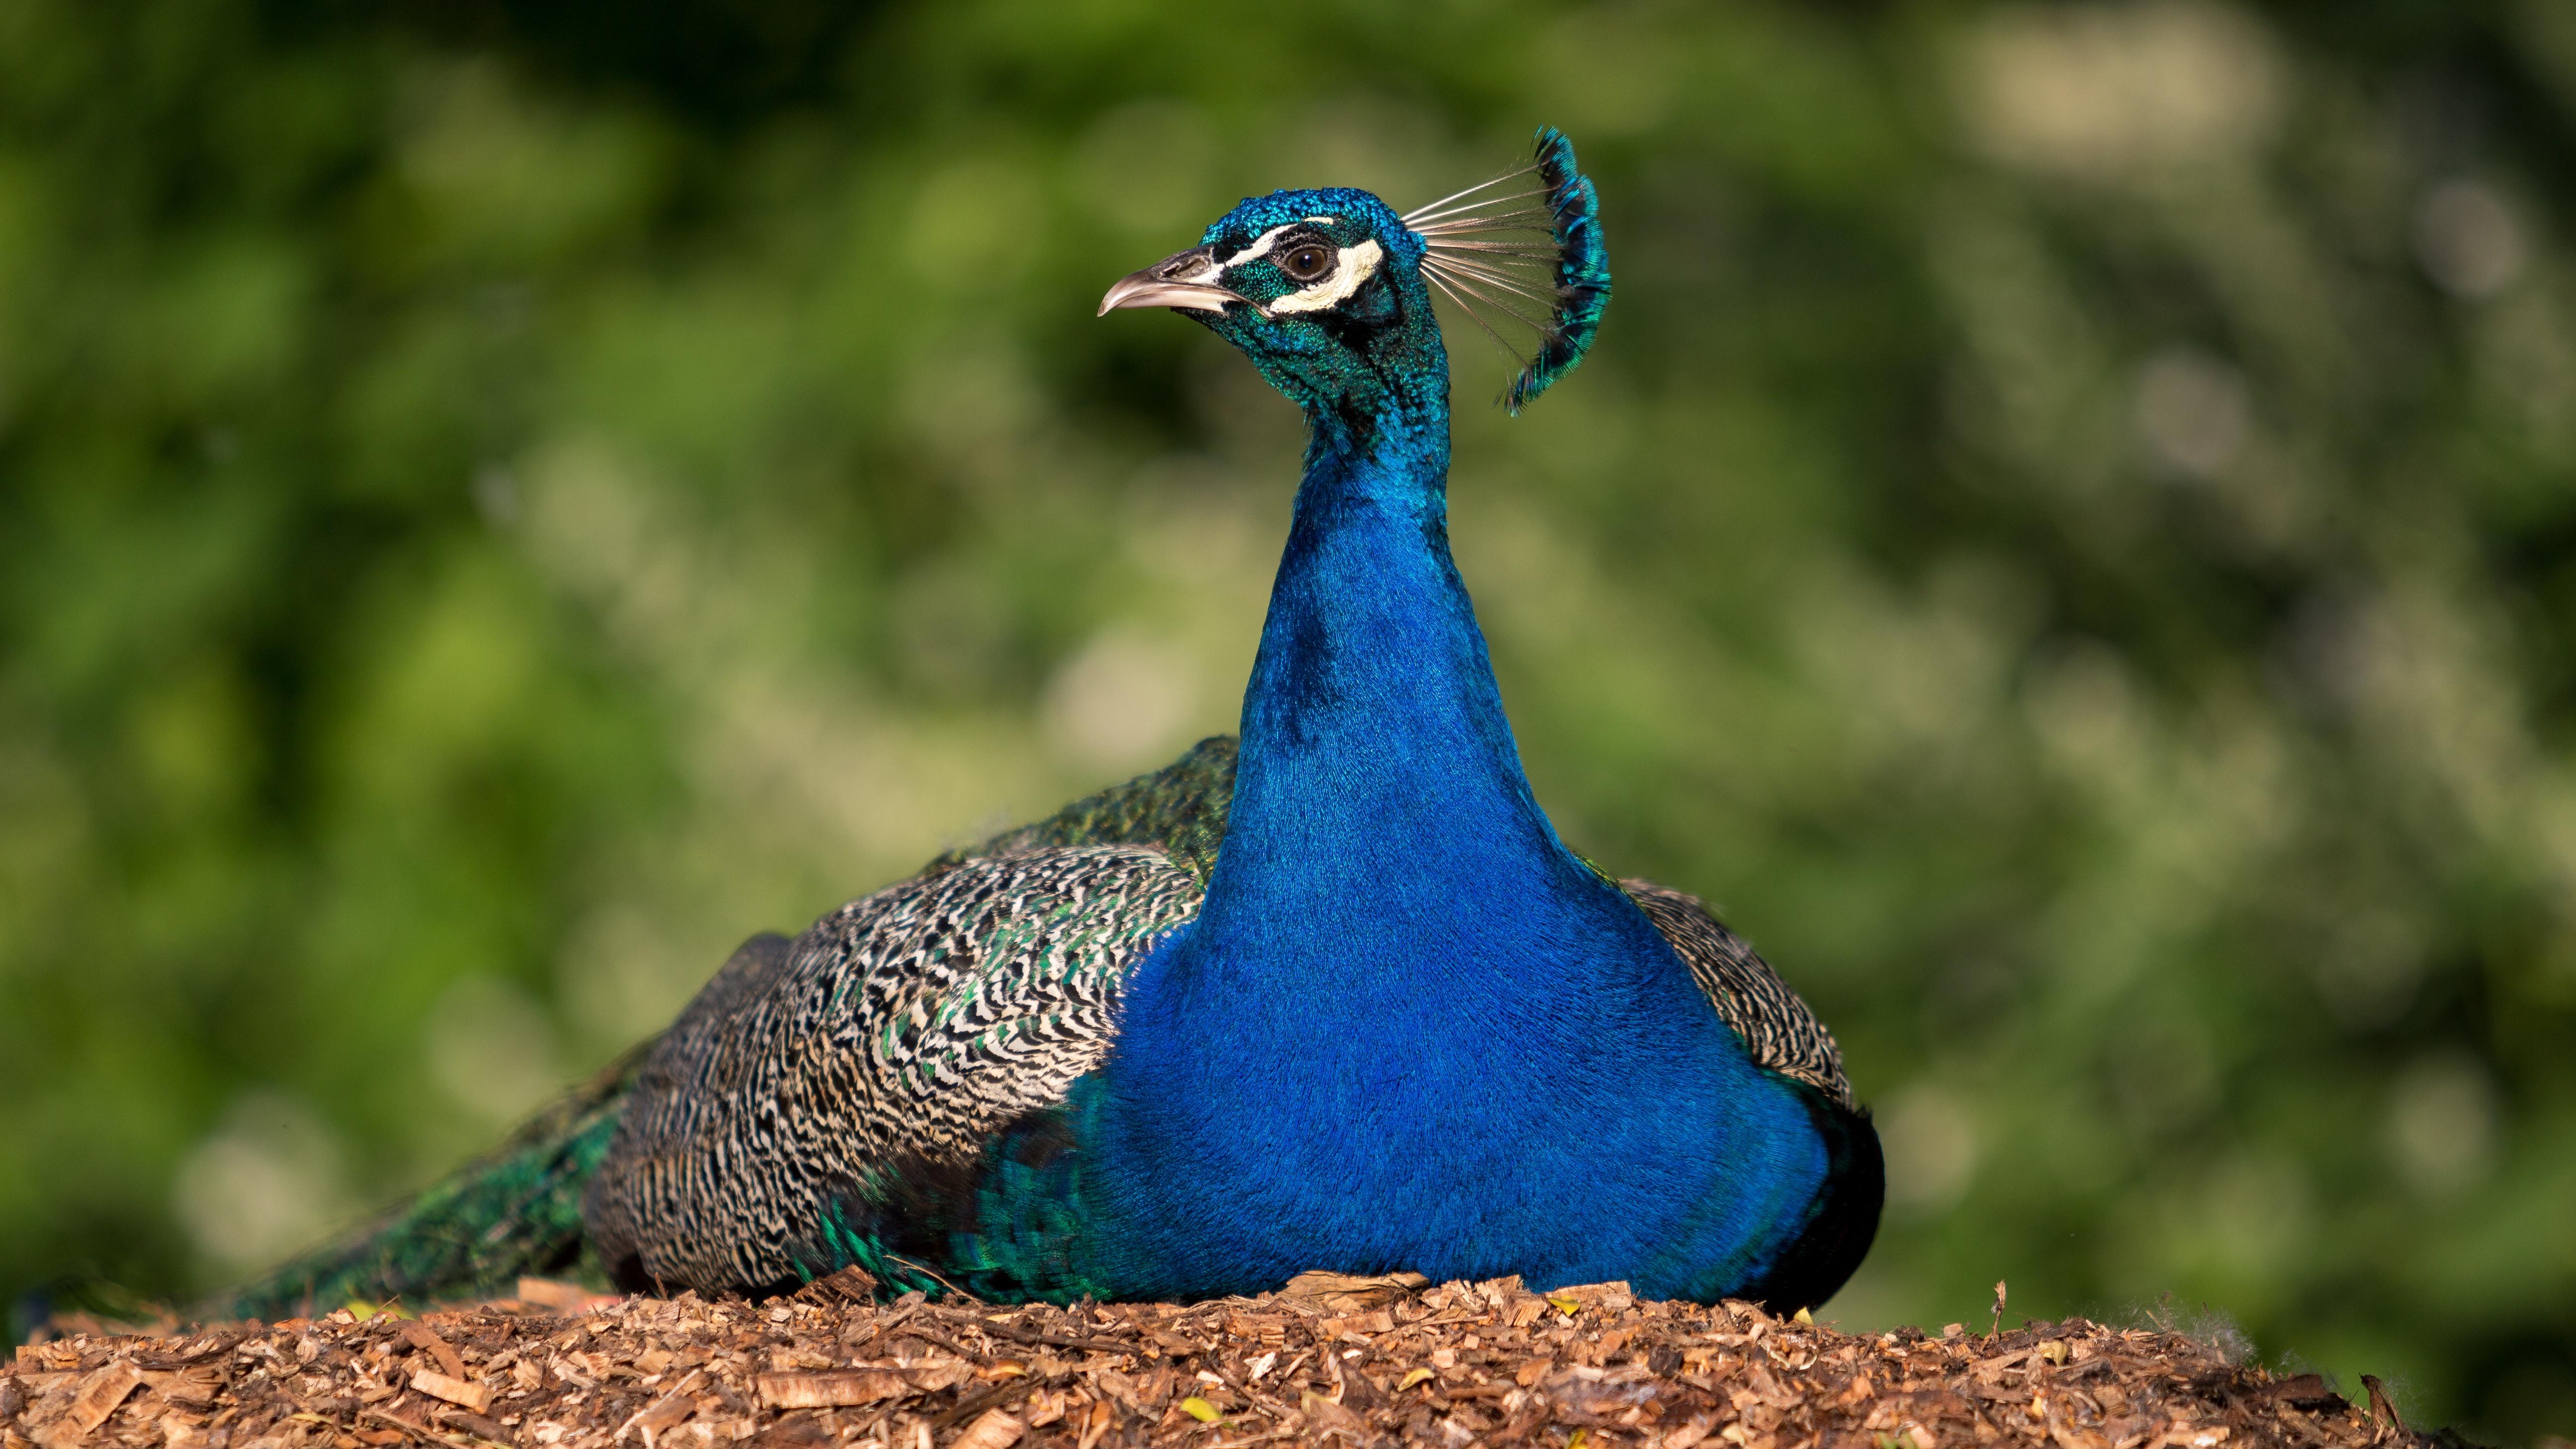 Nature Bird Prairie Animal Wildlife Beak Color Blue Colorful Fowl Fauna Peacock Plumage Galliformes Vertebrate Peafowl